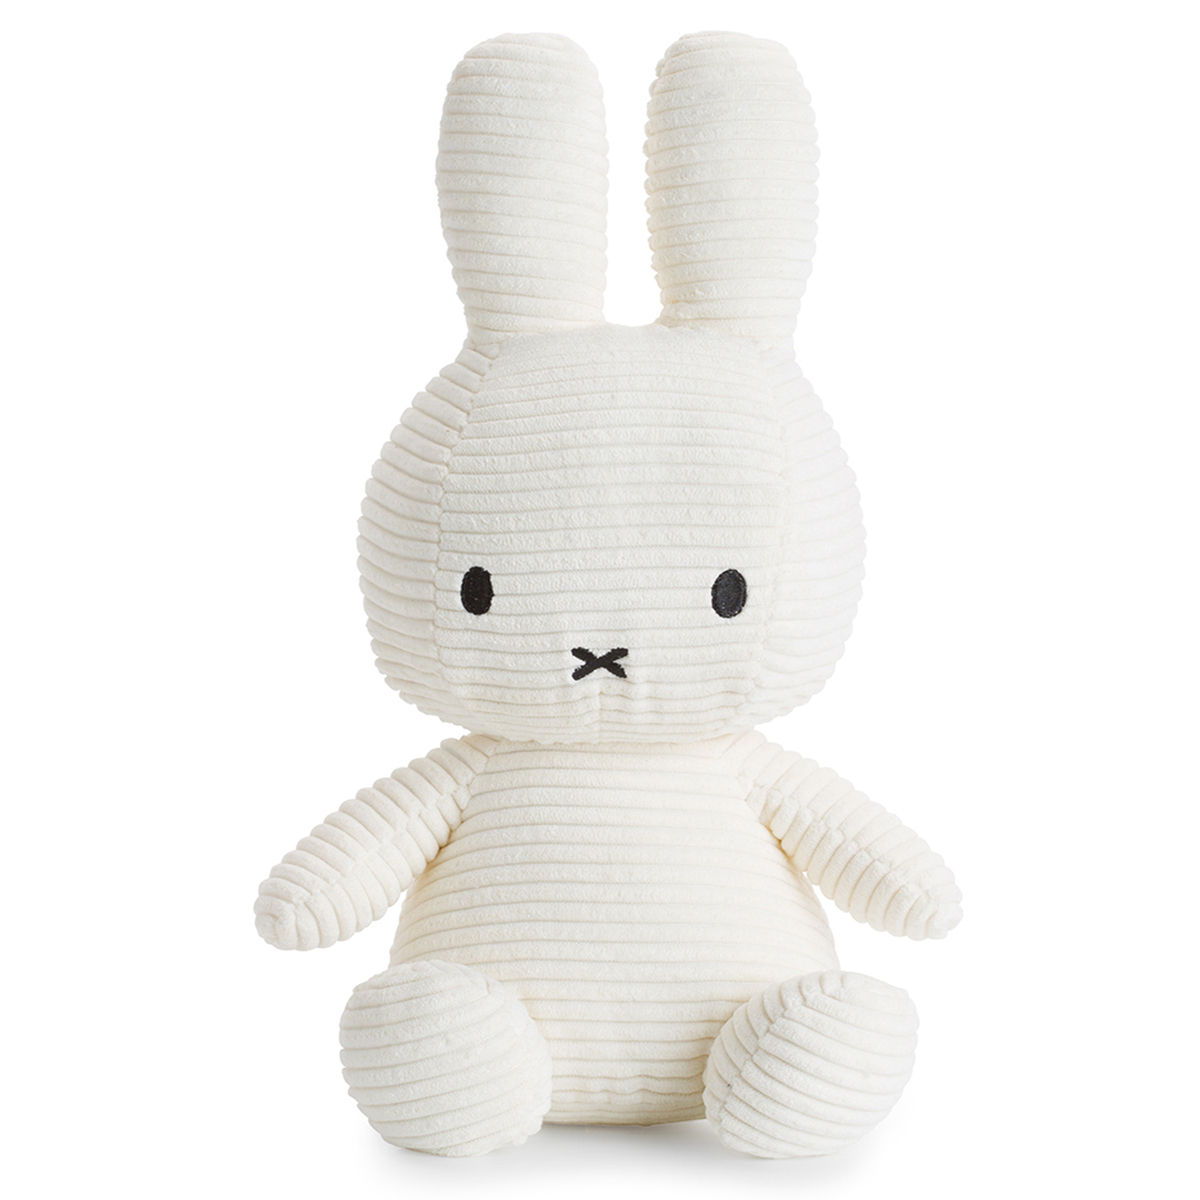 Peluche Lapin Miffy Blanc - Petit Peluche Lapin Miffy Blanc 24 cm